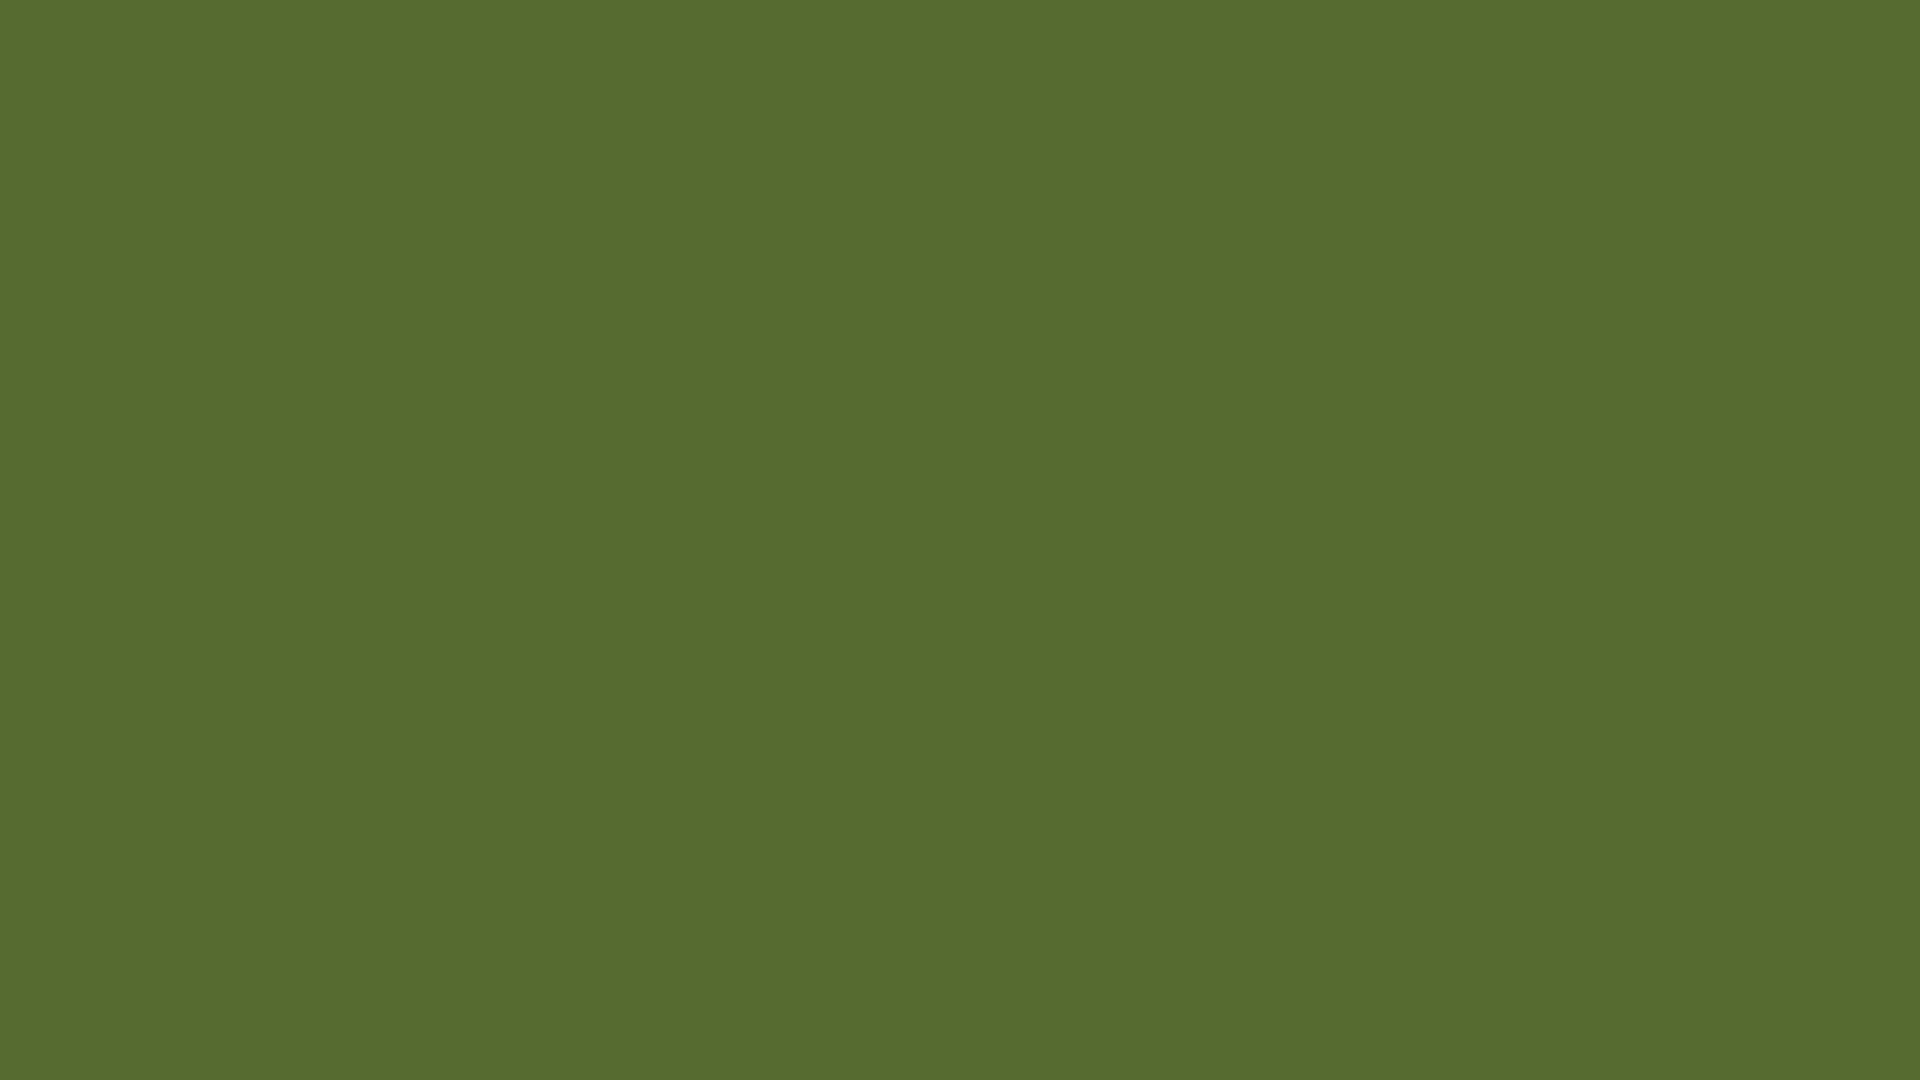 1920x1080 Dark Olive Green Solid Color Background